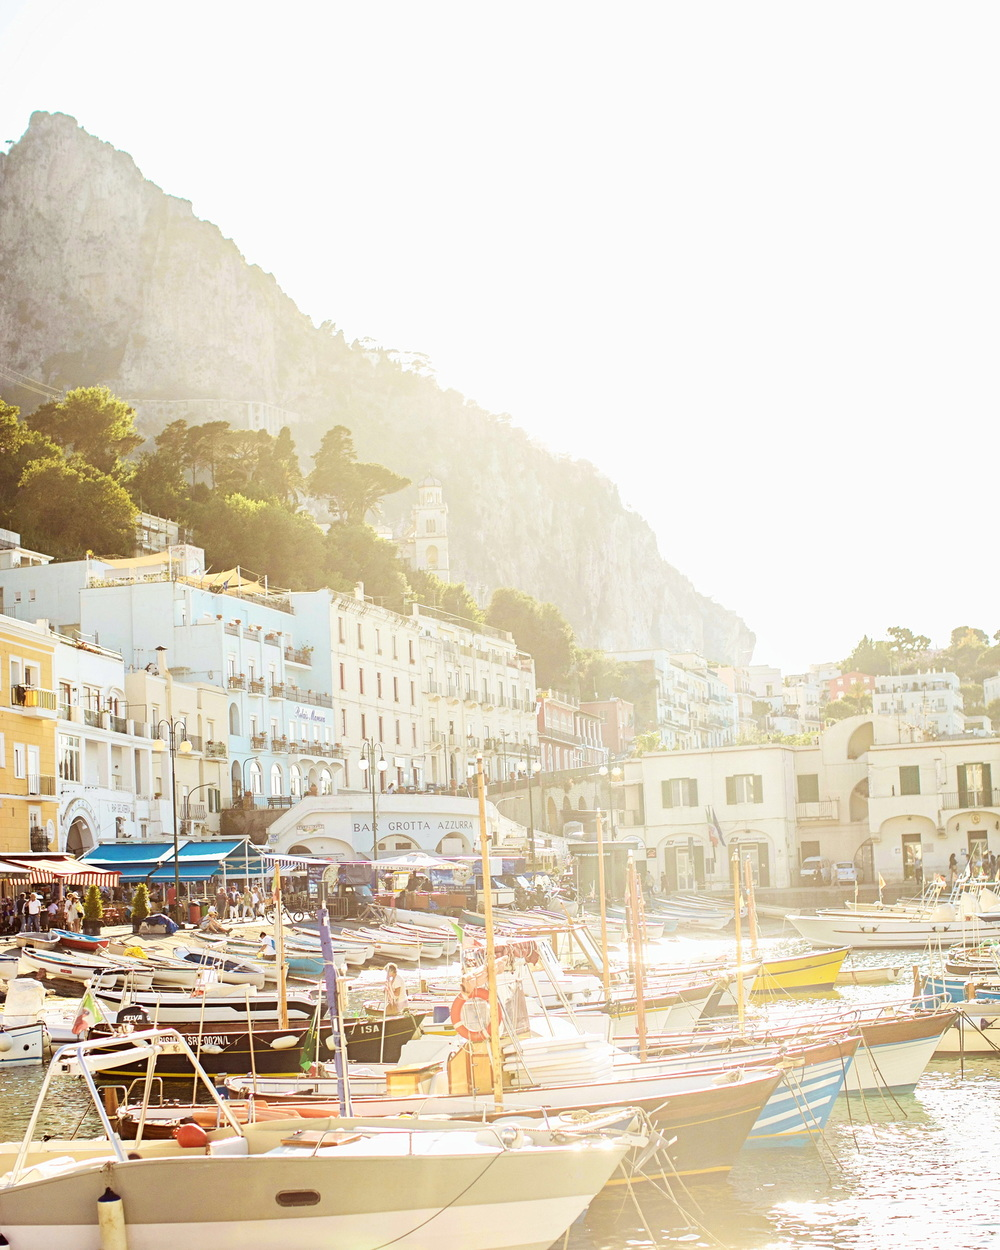 Capri, Italy  June 2016